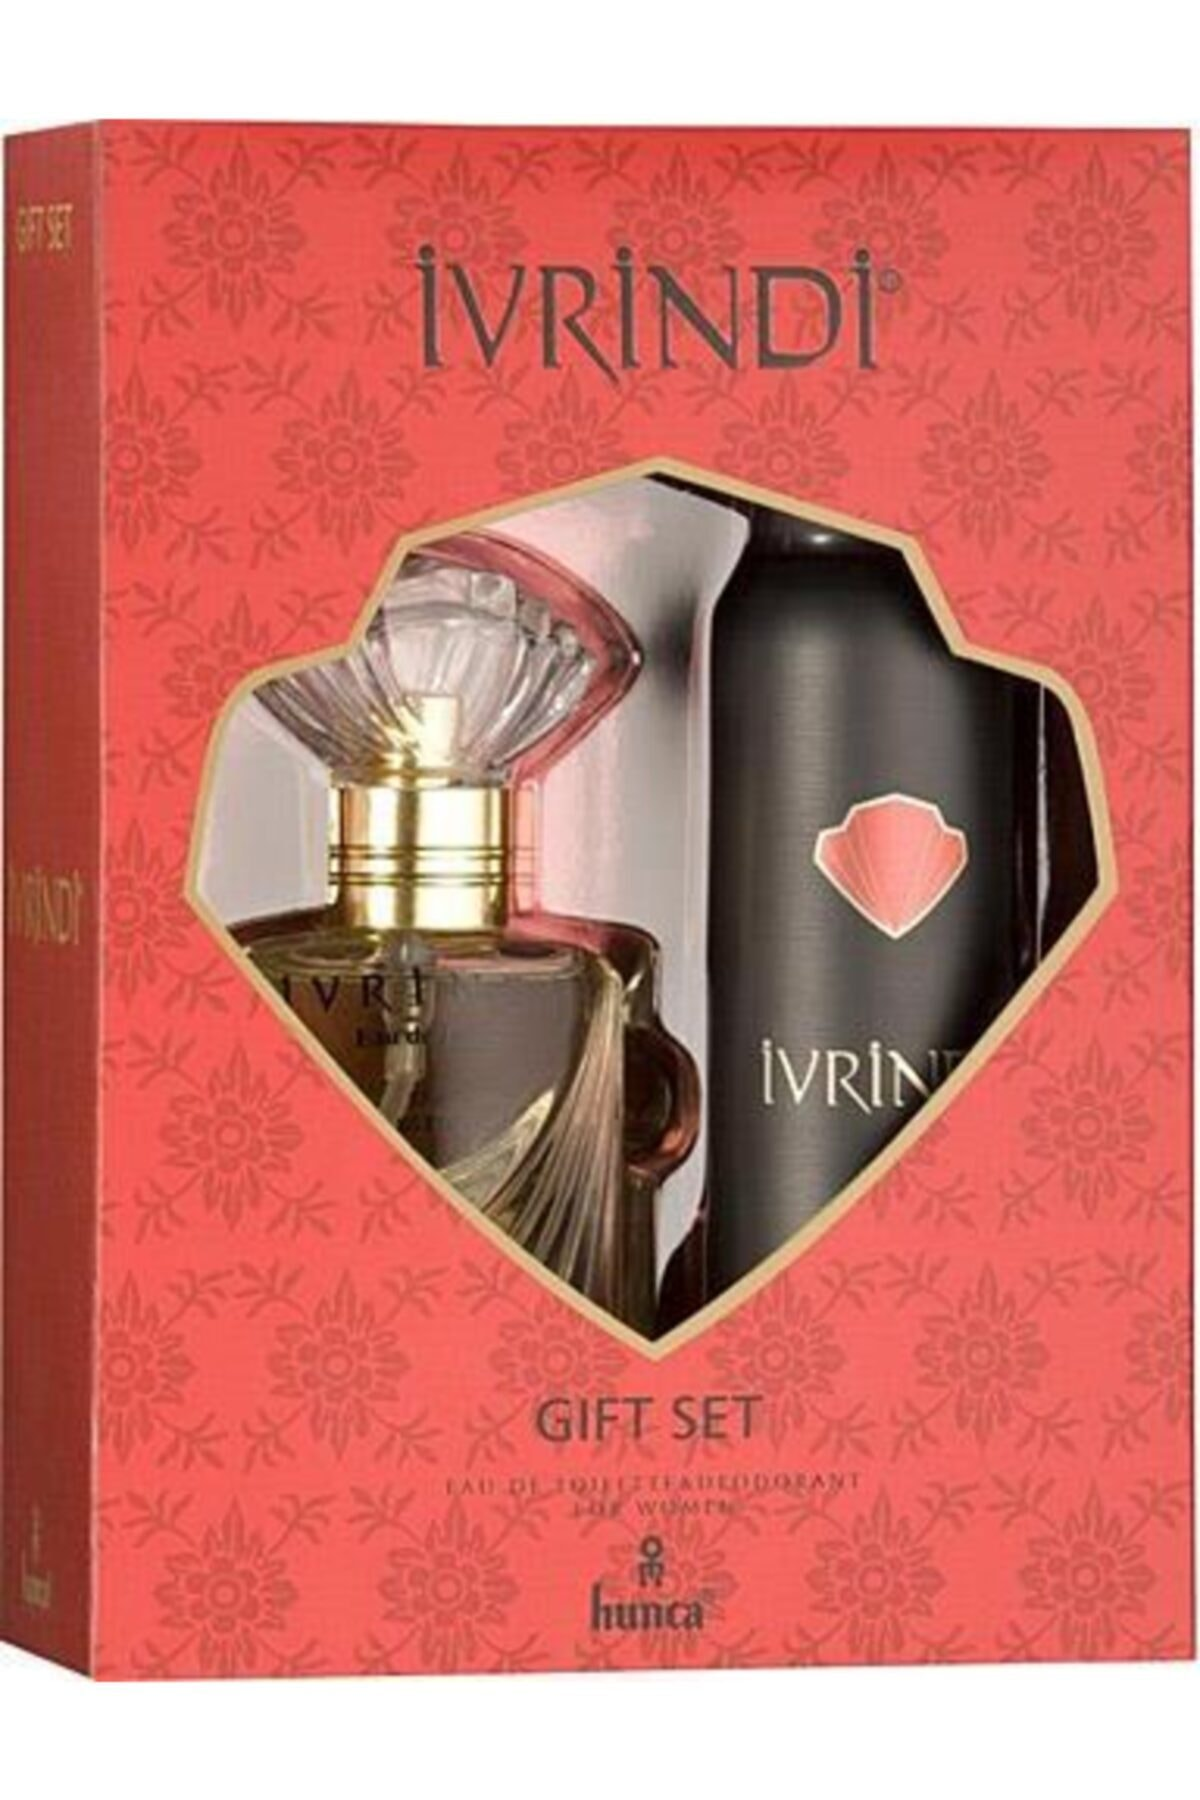 Ivrindi Edt 55 Ml Kadın Parfüm Seti 1